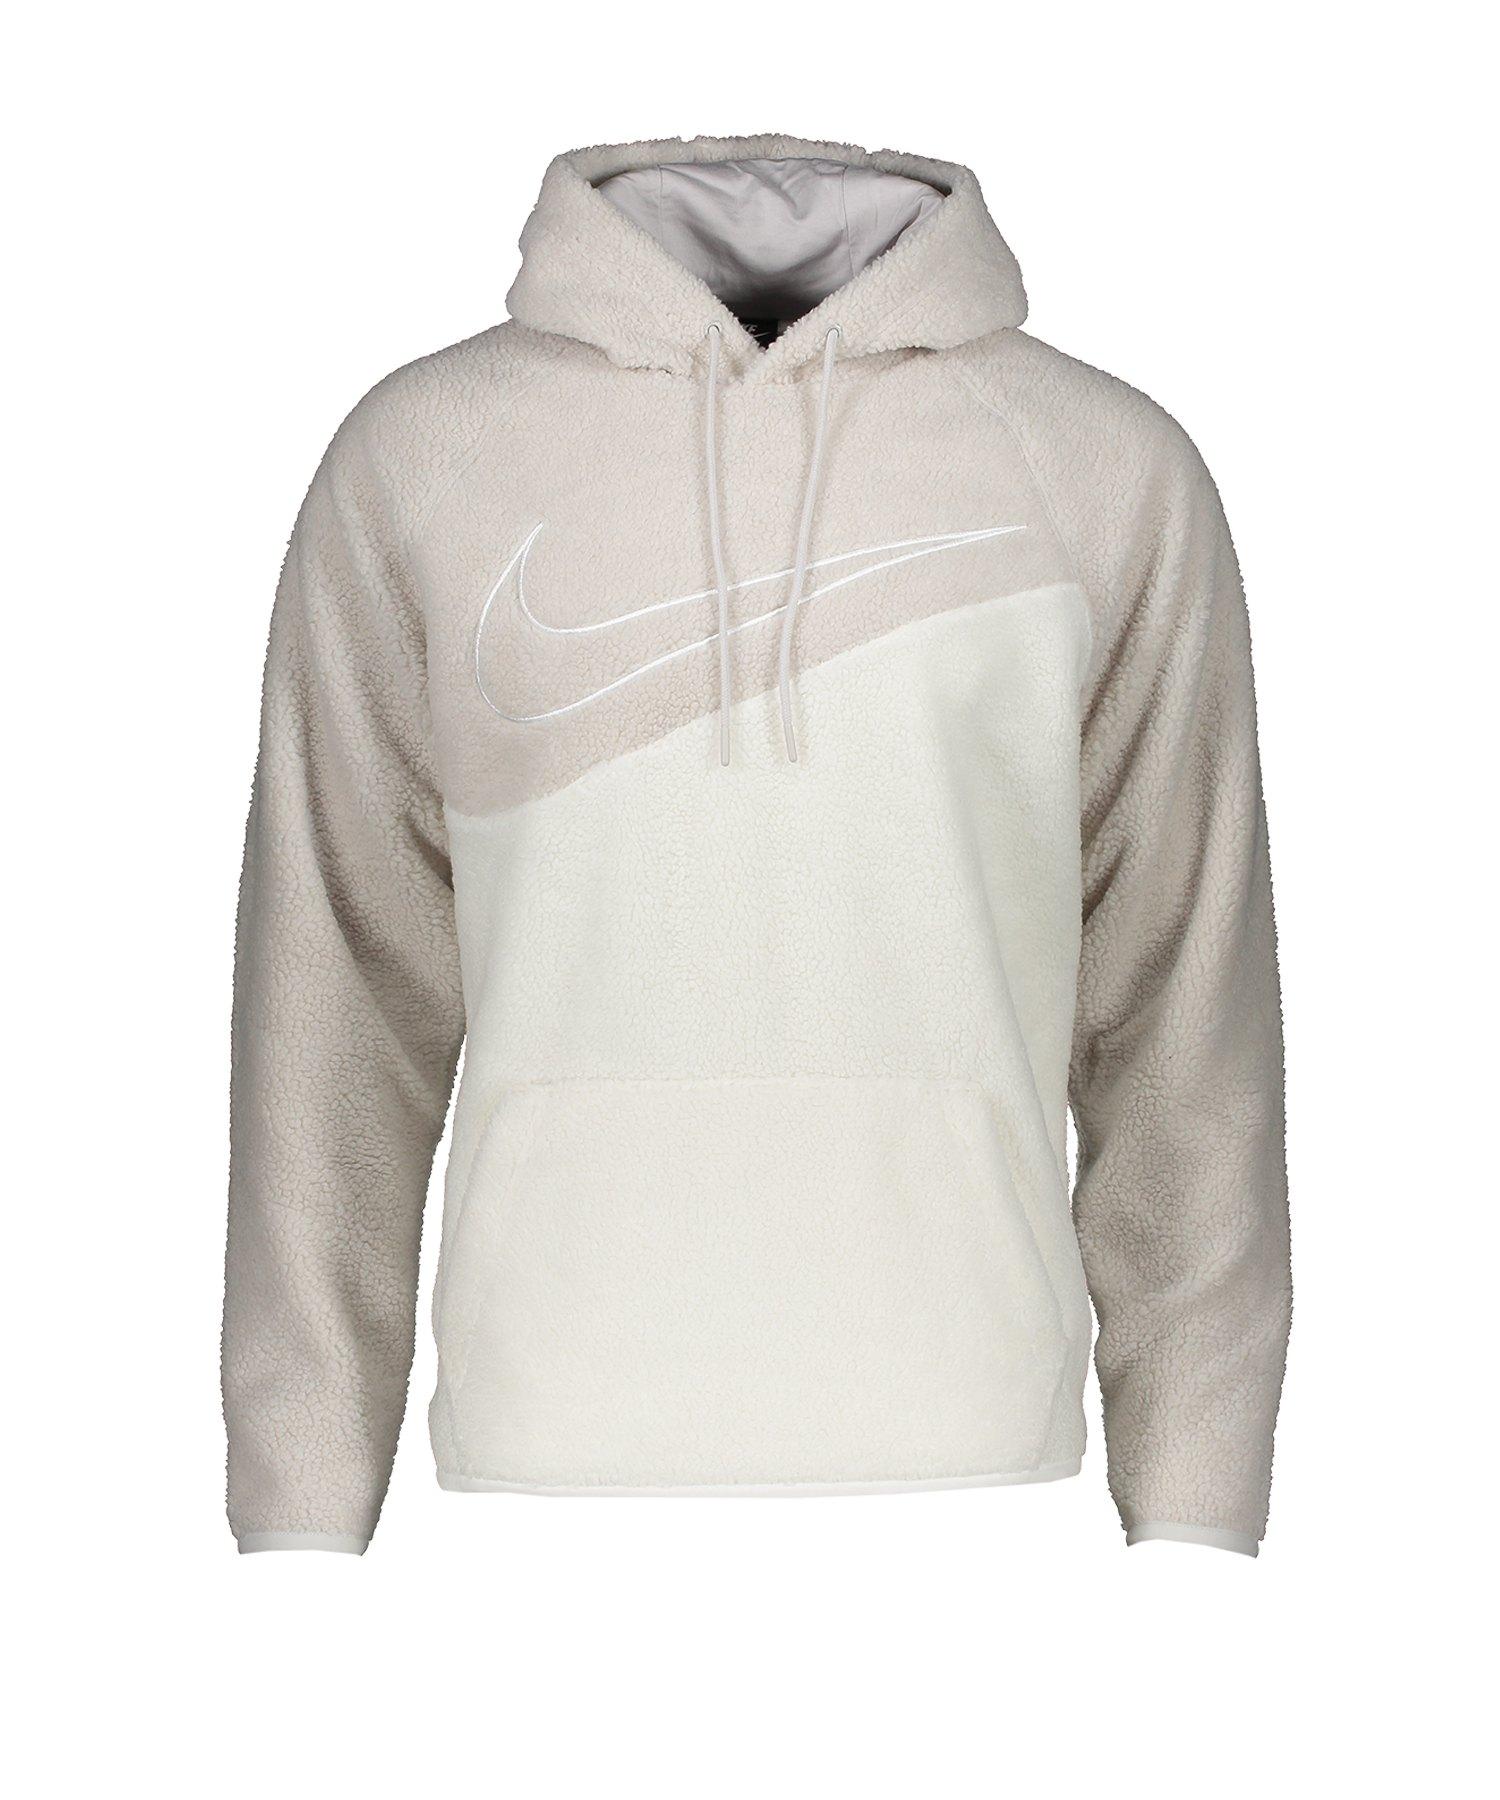 Nike Swoosh Kapuzensweat Hoody Grau F078 - grau